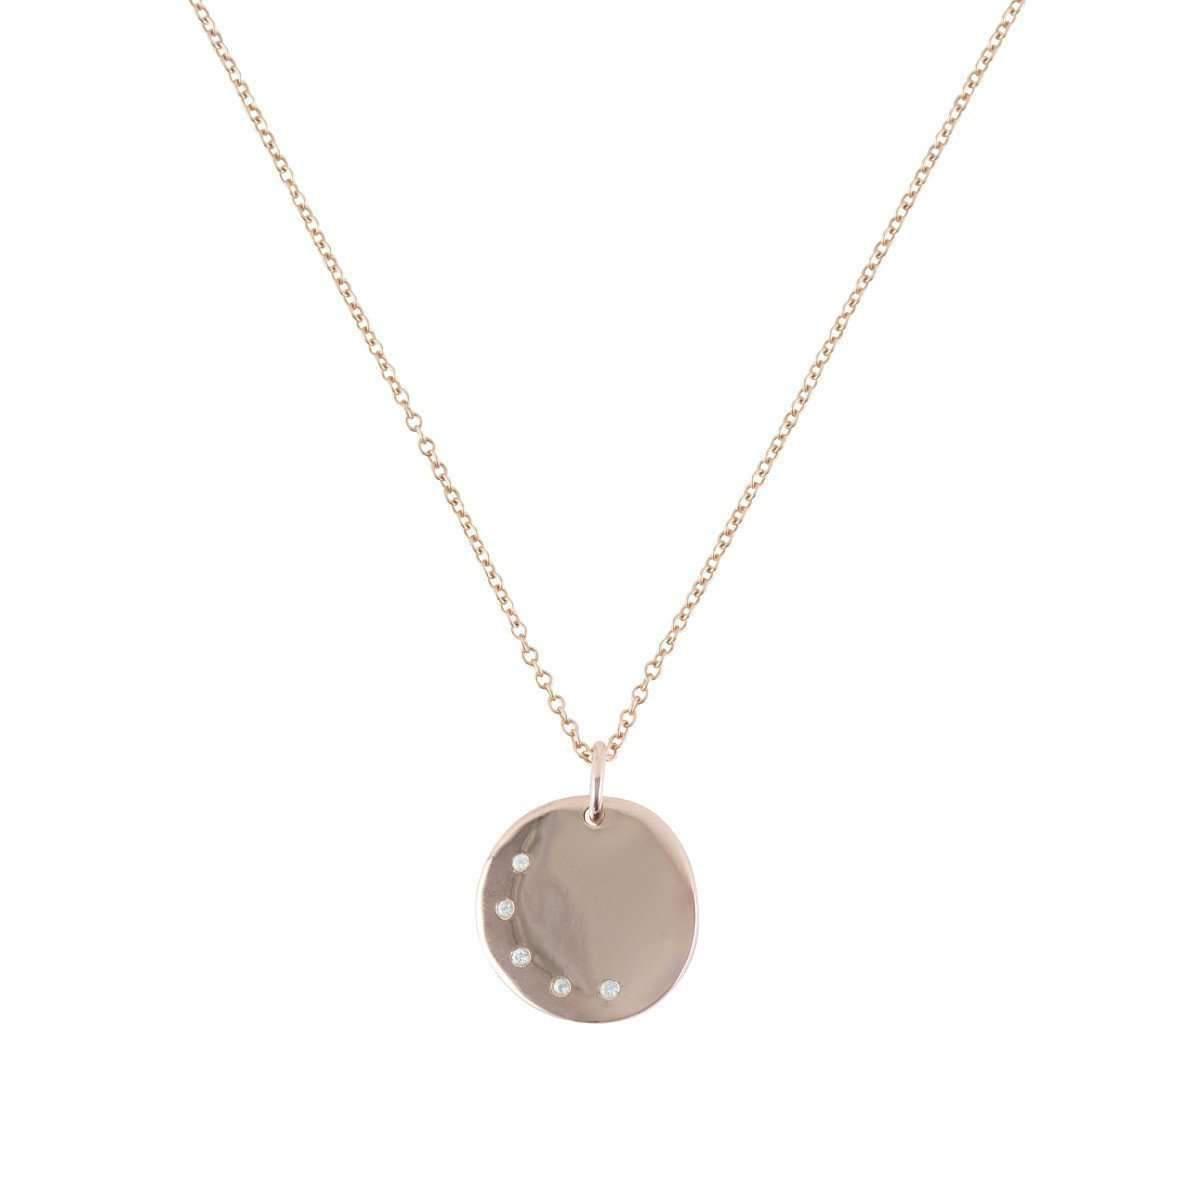 Deborah Blyth Jewellery Rose Gold Bumble Bee Necklace nDUxZv